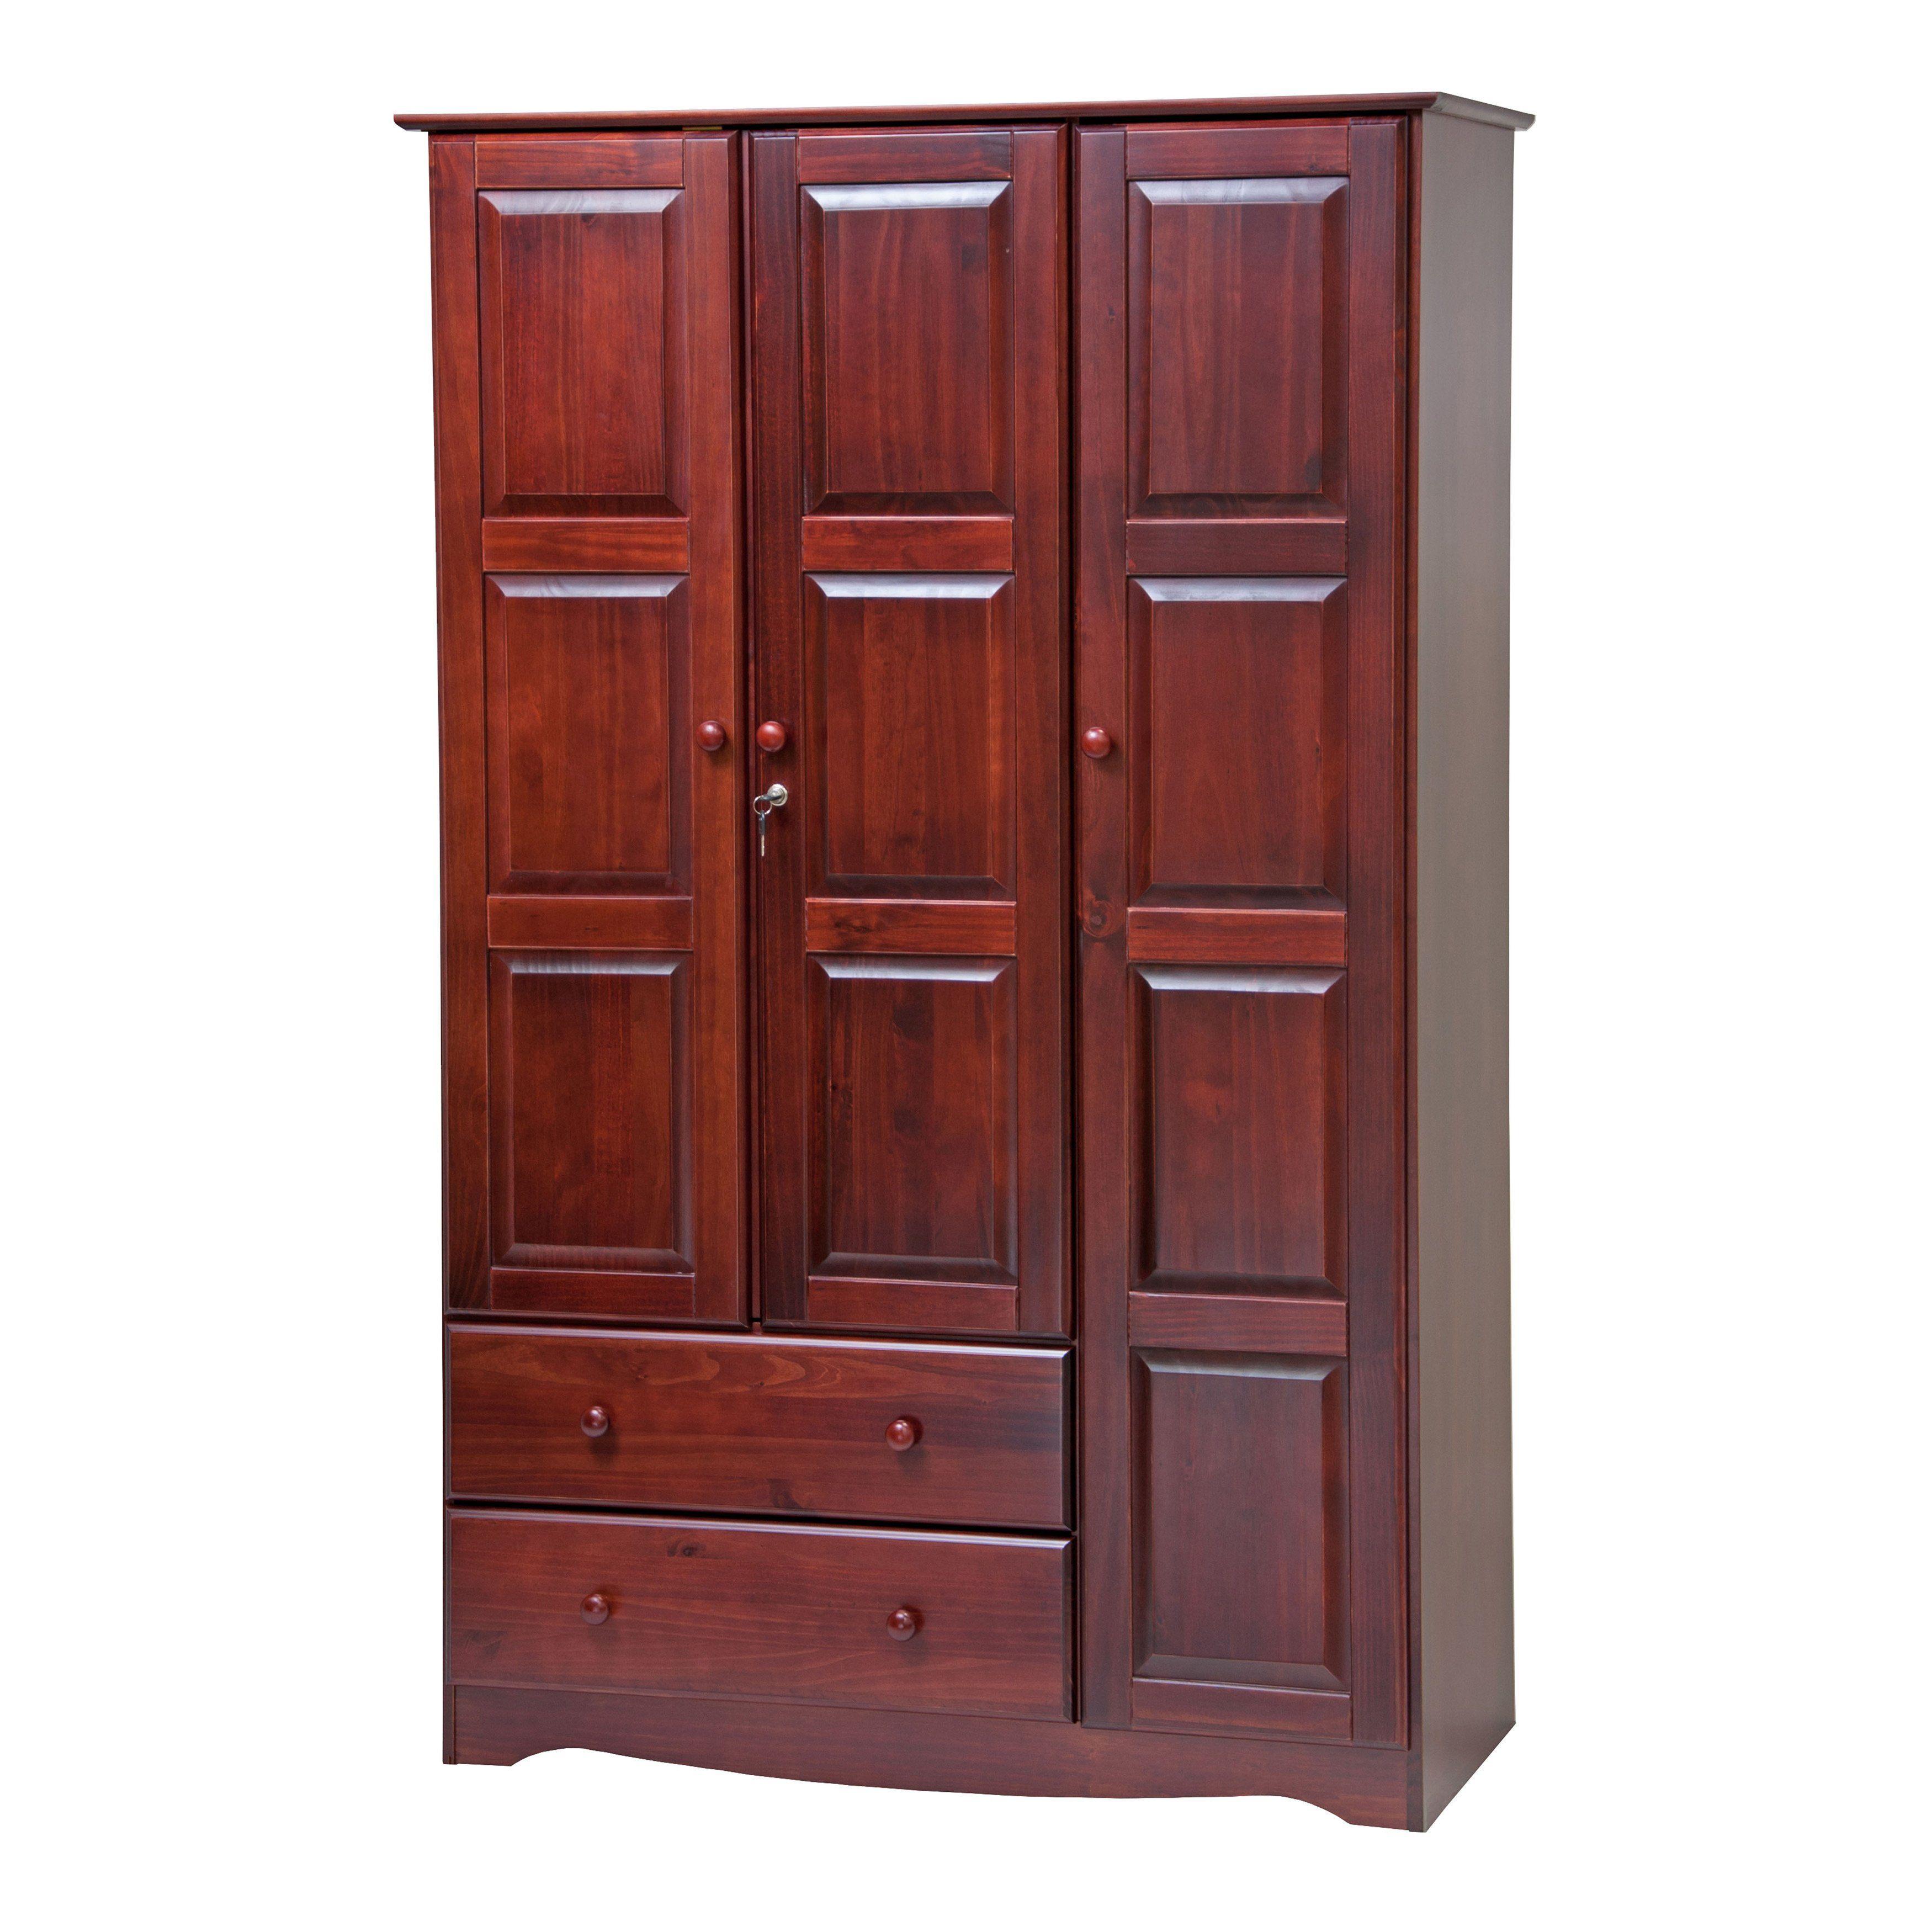 Best Copper Grove Caddo Grand Solid Wood 3 Door Wardrobe With Lock 45 75 W X 72 H X 20 75 D Solid 400 x 300